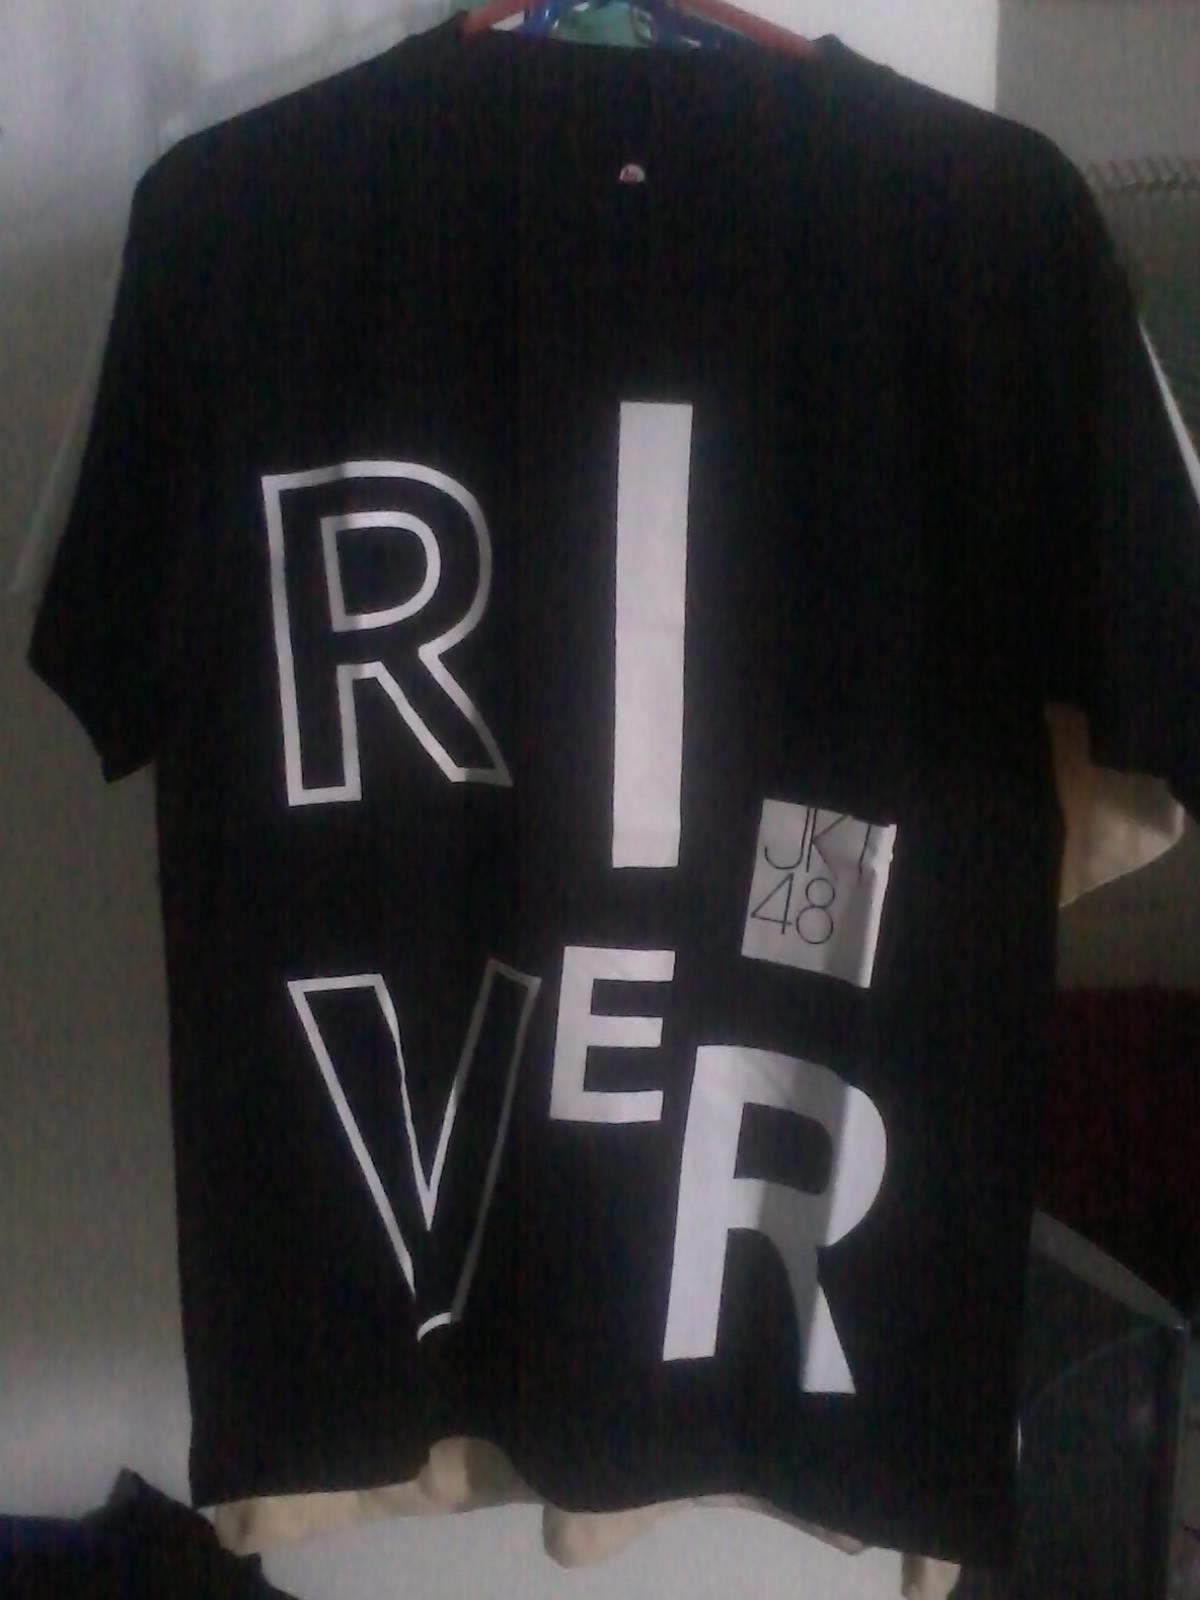 Kaos RIVER - JKT48 - Semarang